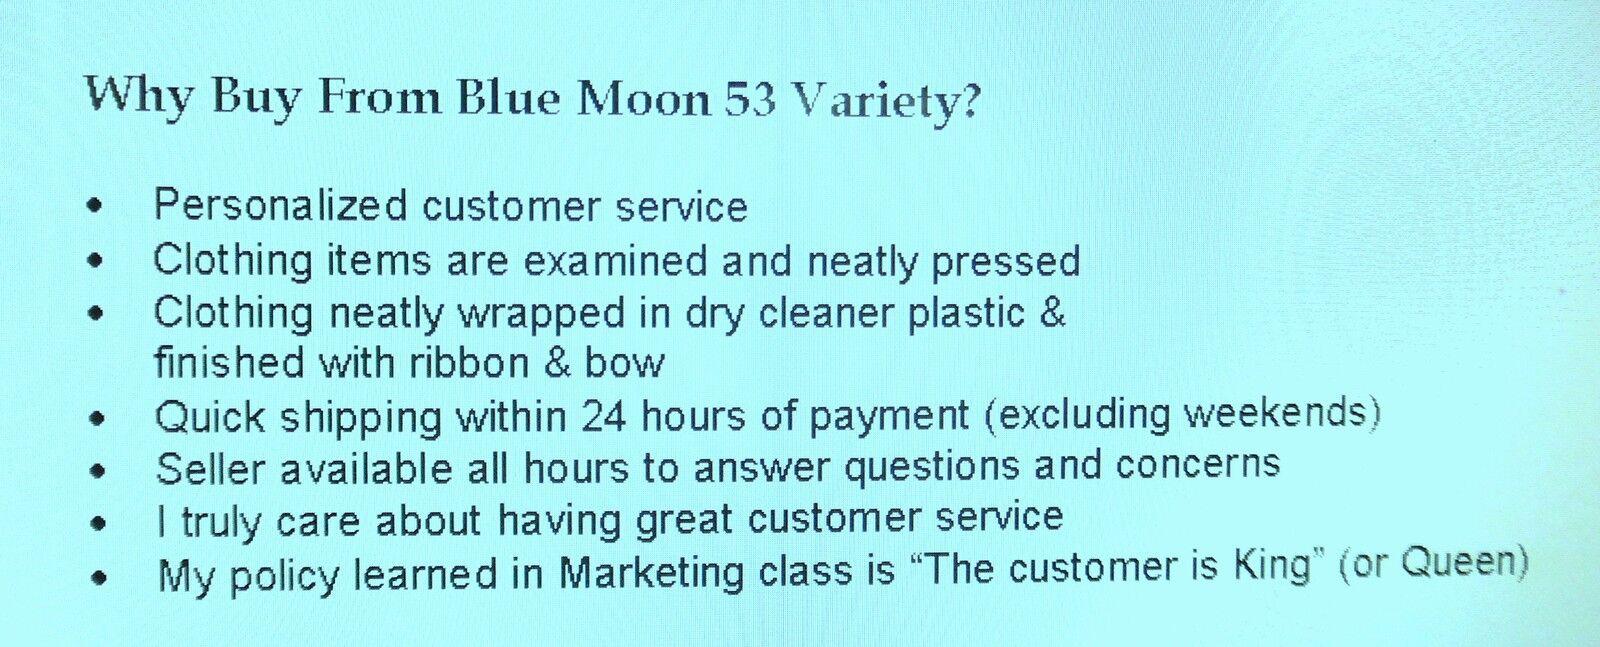 Blue Moon 53 Variety